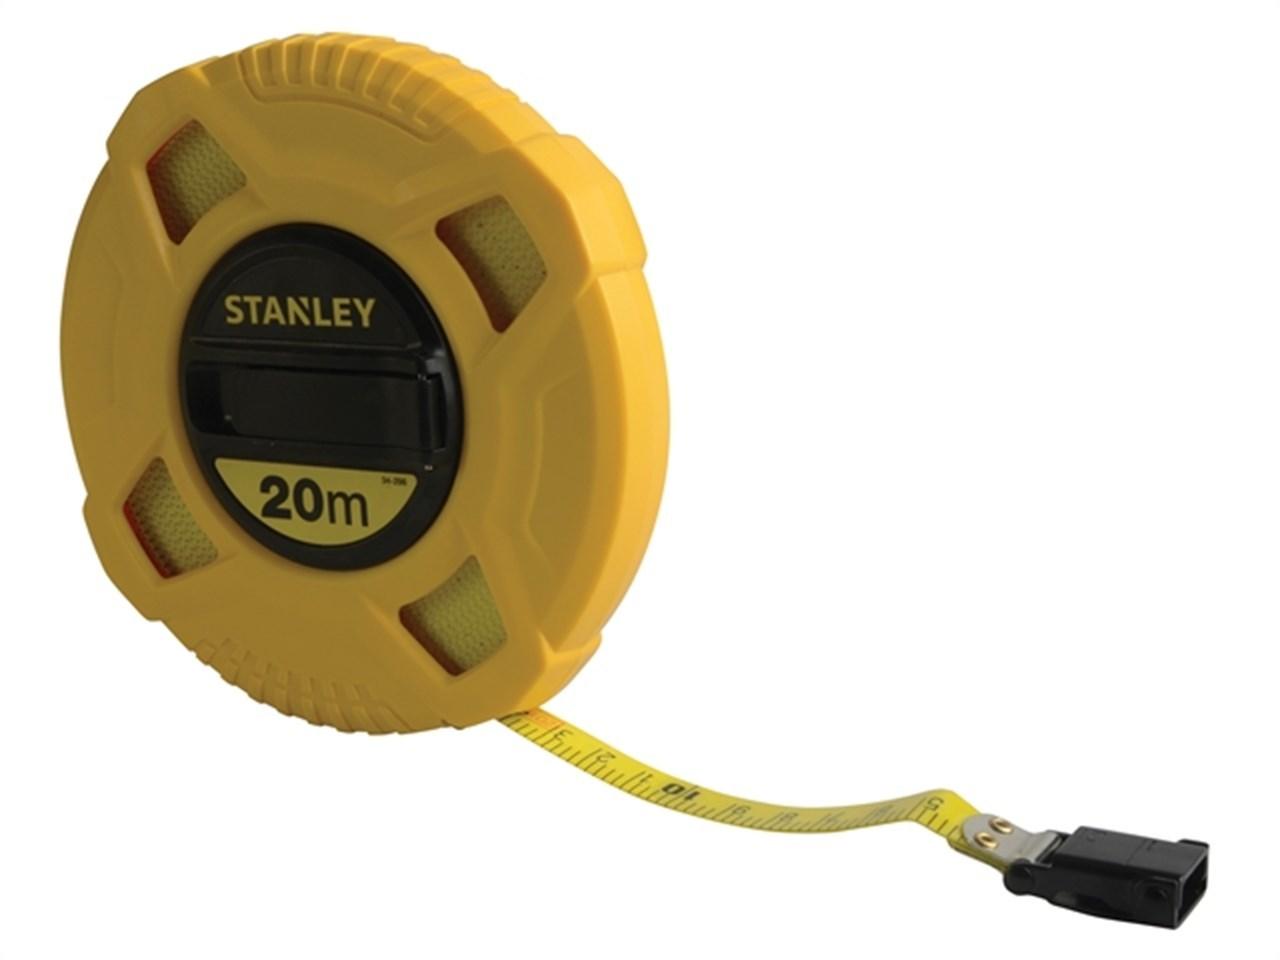 Рулетка 20м Fiberglass Stanley 0-34-296